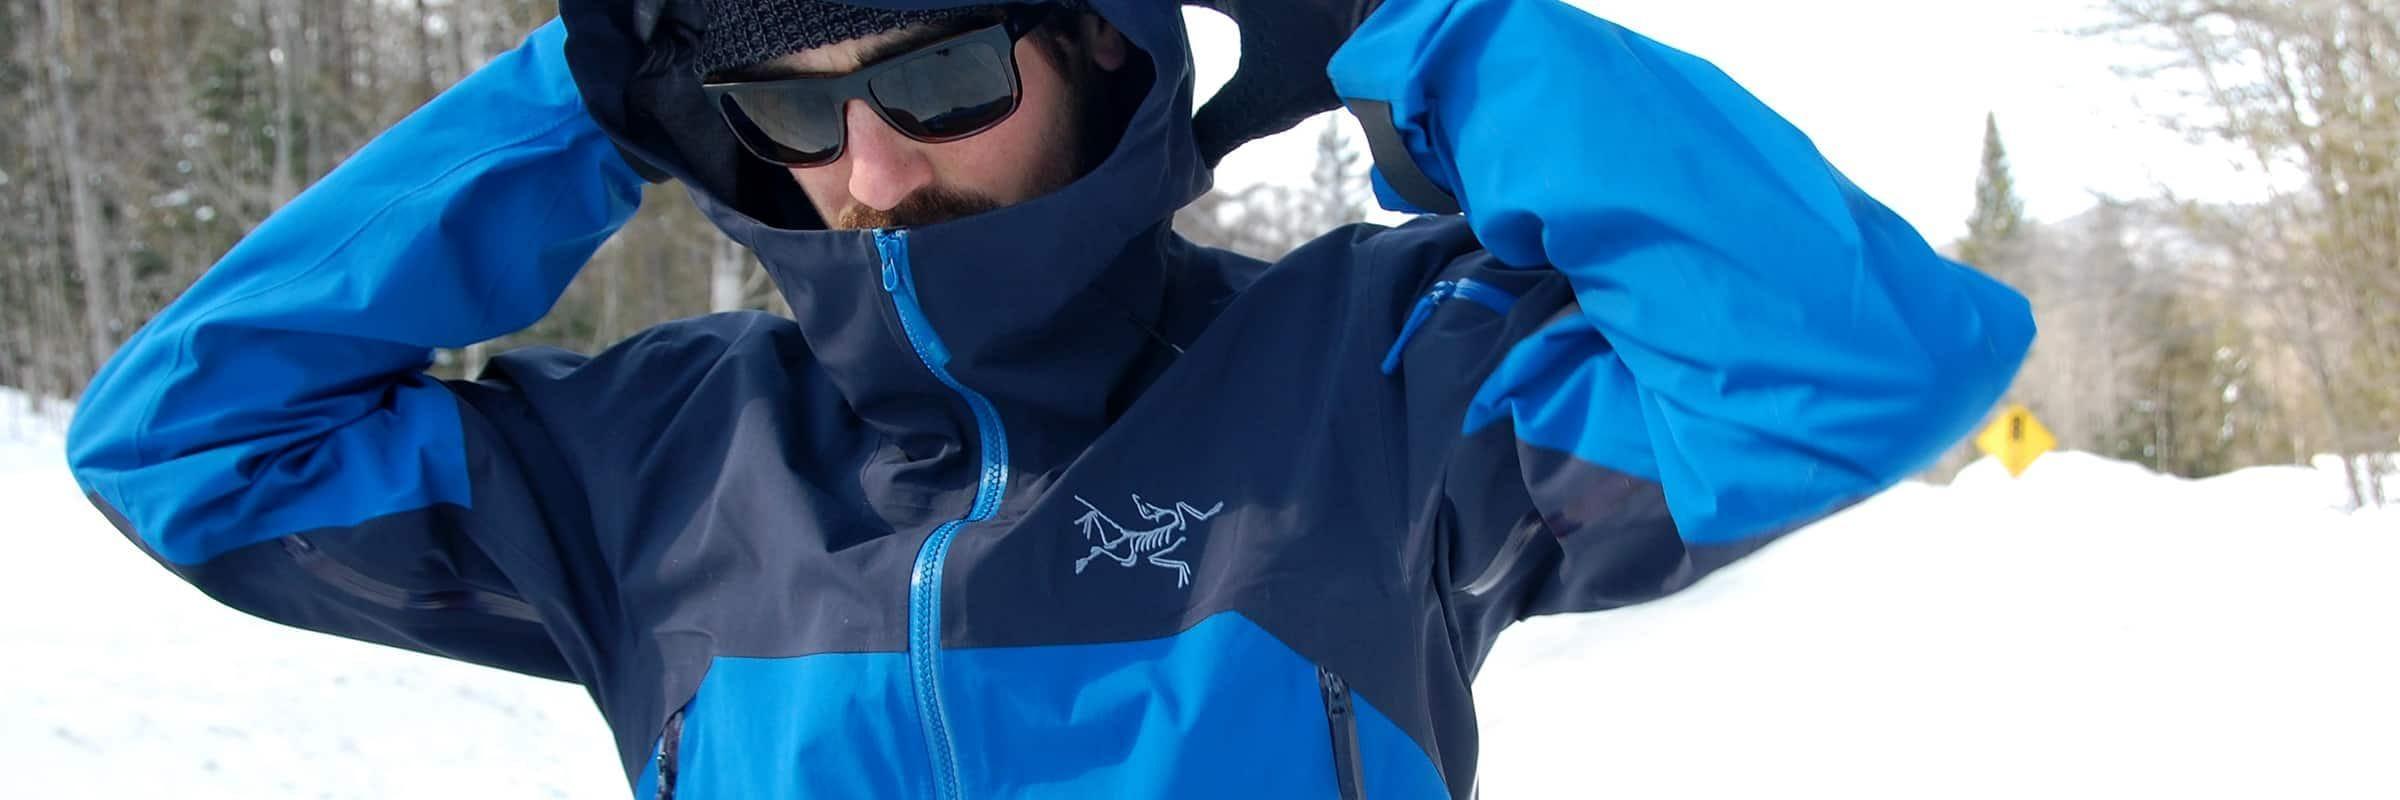 Arc'teryx, Ski & Snowboard. Arc'teryx Men's Rush Jacket Reviewed